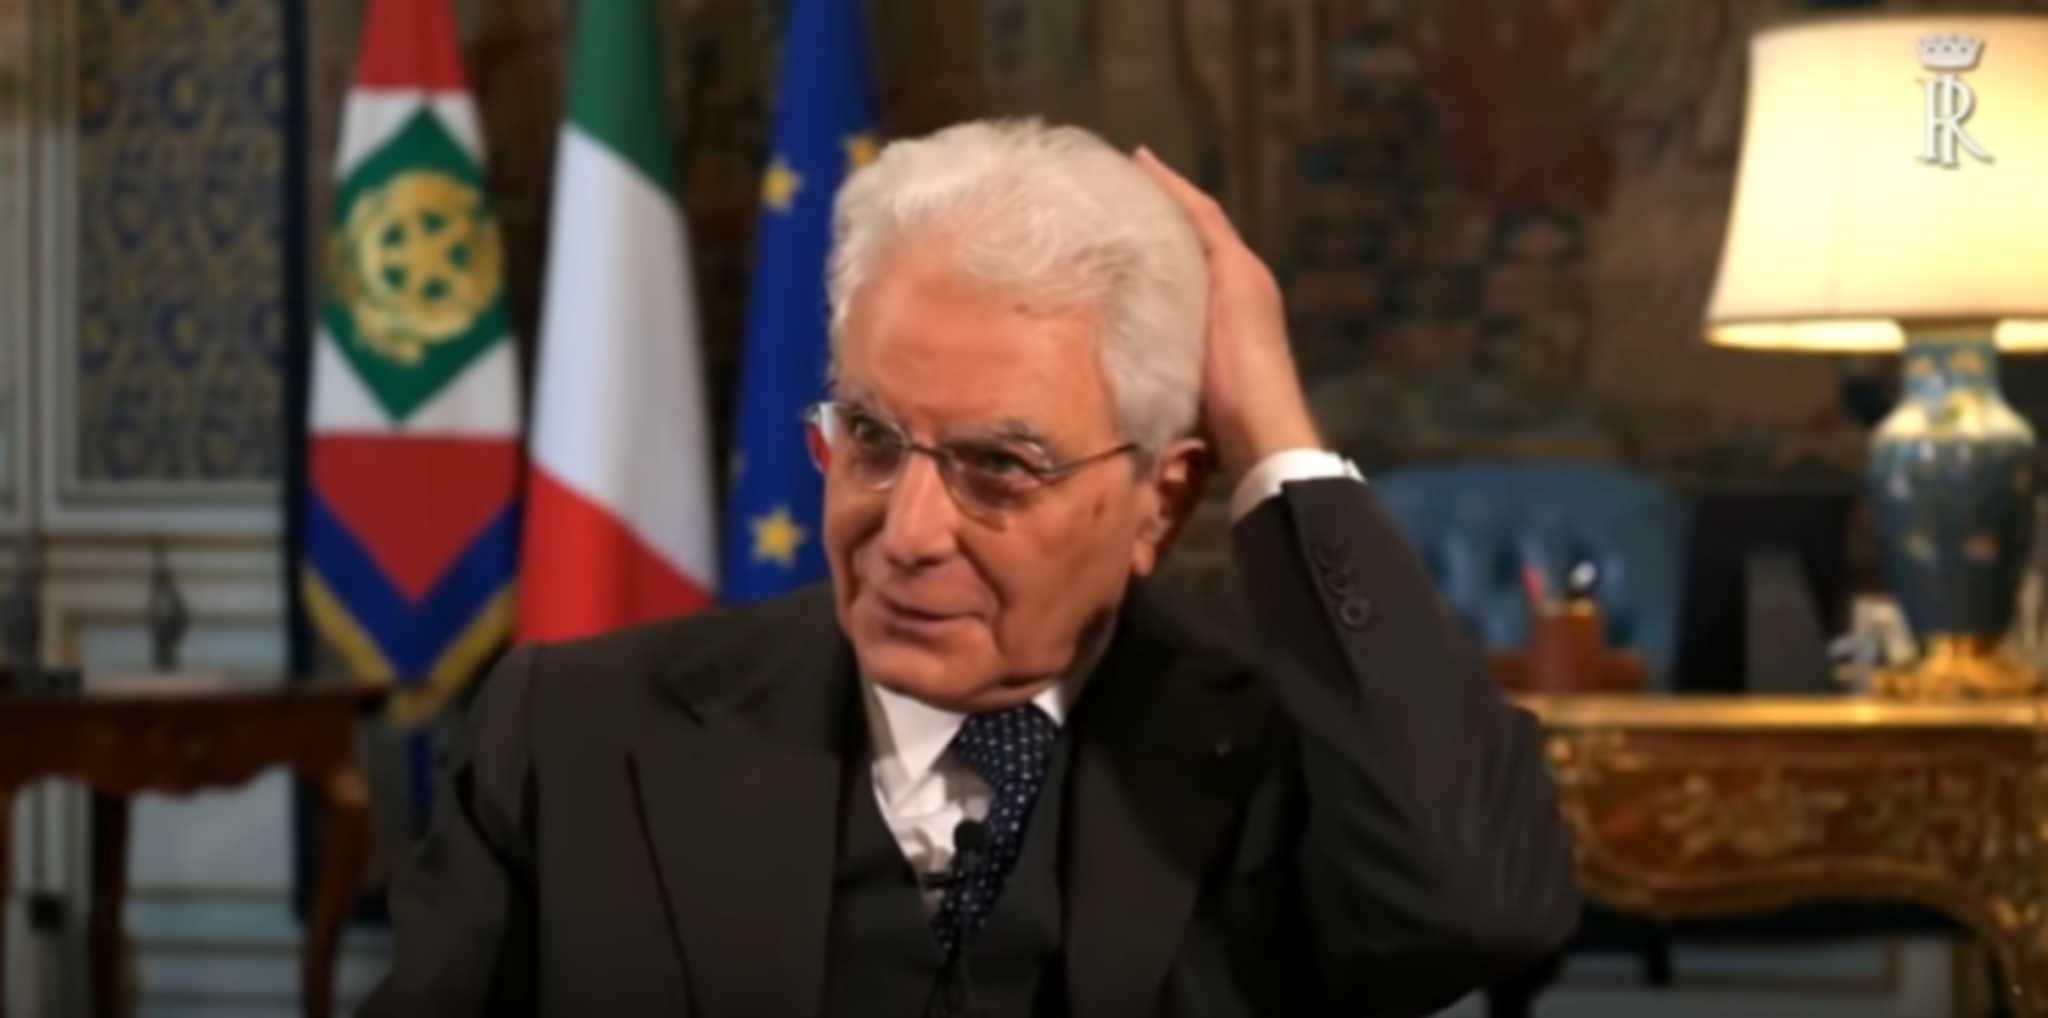 Euro 2020: Με 1000 οπαδούς και τον Πρόεδρο της Δημοκρατίας η Ιταλία στον τελικό του «Γουέμπλεϊ»